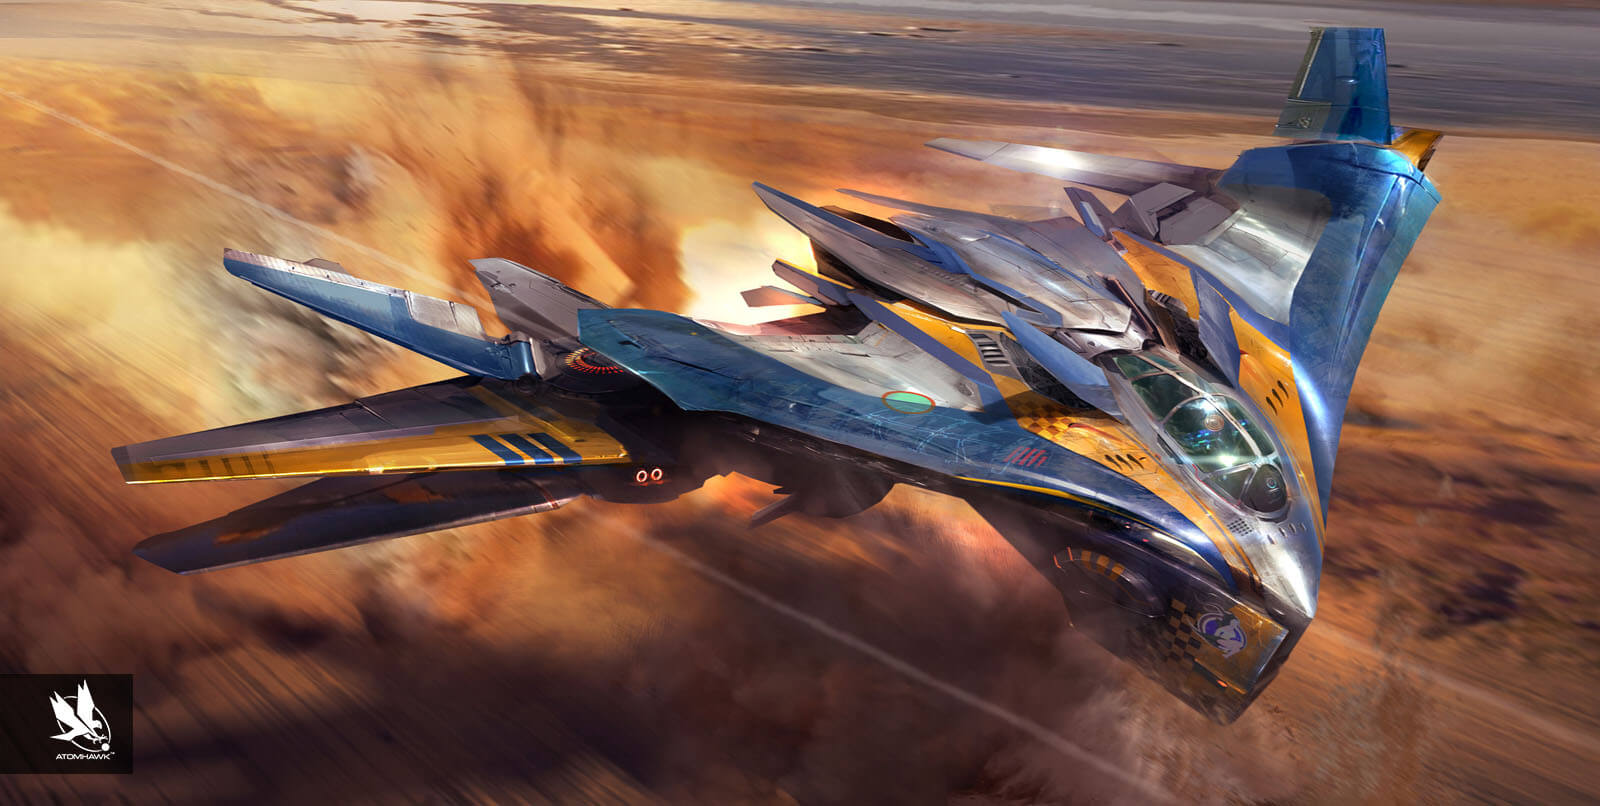 Atomhawk_Marvel_Guardians of the Galaxy_Concept Art_Spacecraft Design_Milano In Flight_Services.jpg